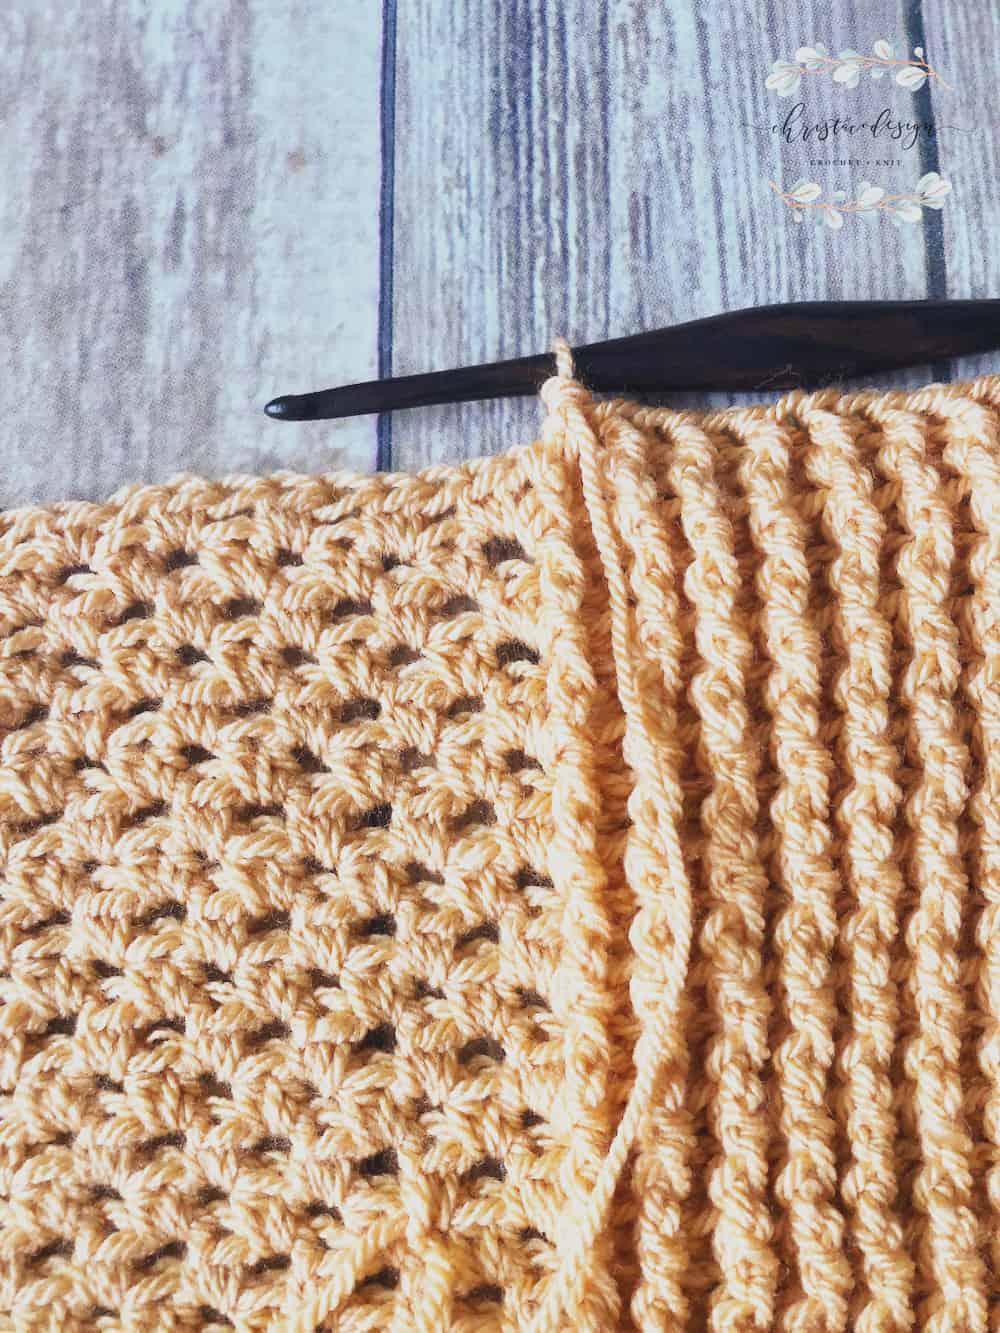 picture of crochet throw blanket in orange border stitches